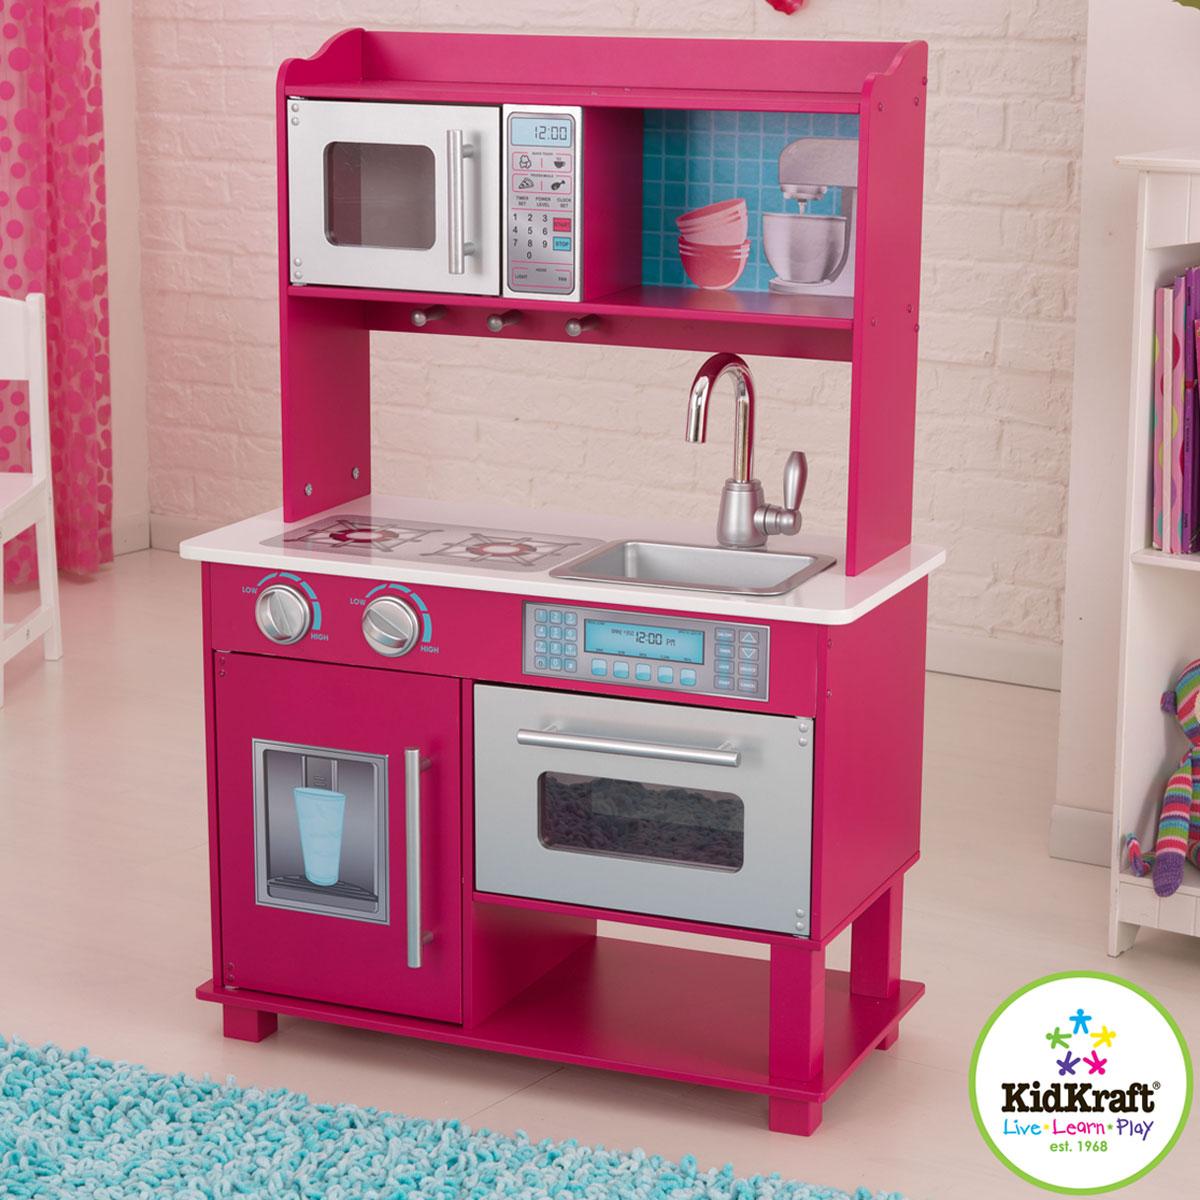 kidkraft cuisine gracie 53277. Black Bedroom Furniture Sets. Home Design Ideas